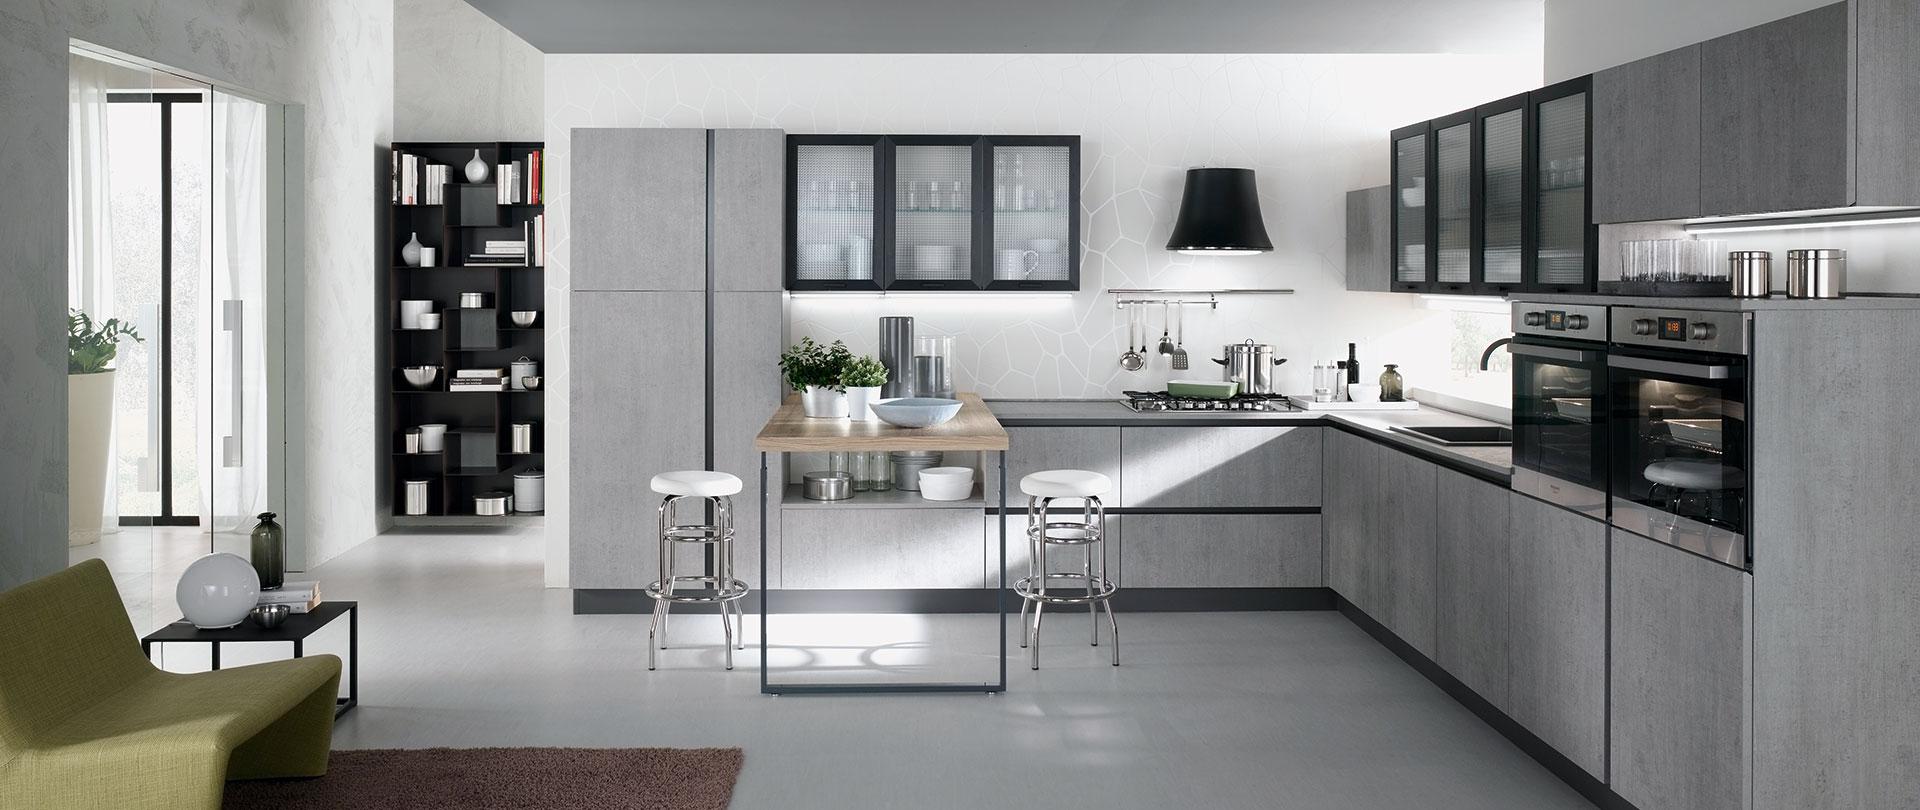 Cucina agor evo cucine - Cucina grigio scuro ...